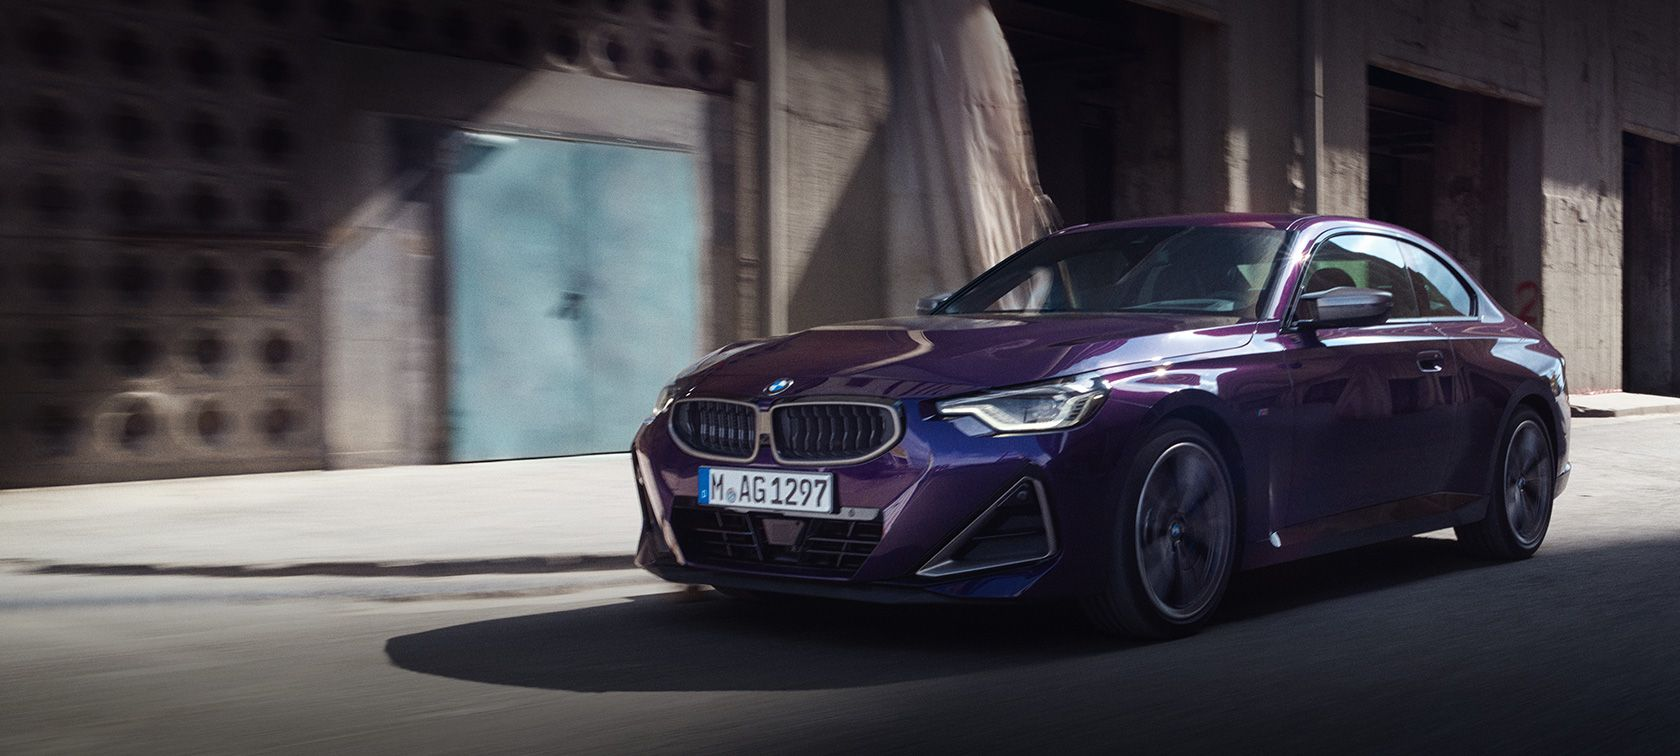 BMW Wagner - BMW 840d xDrive Coupé Angebot